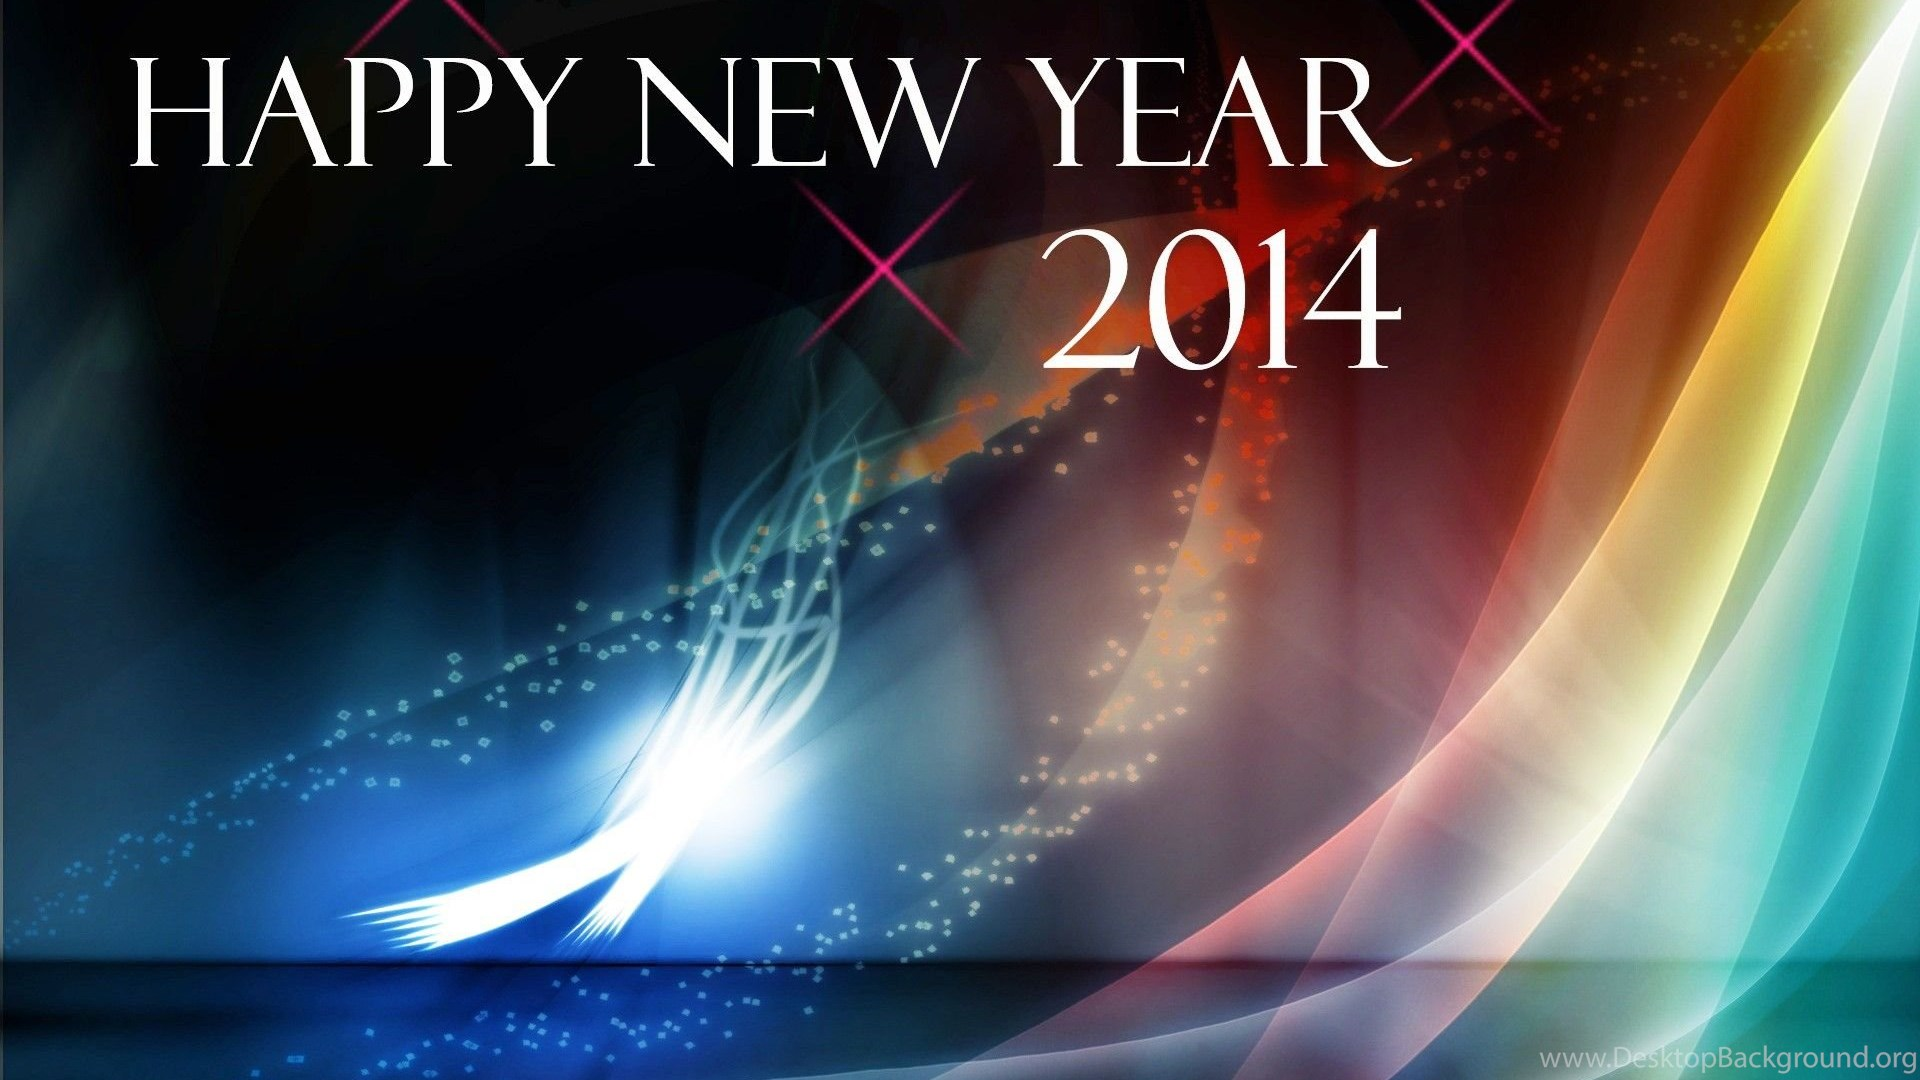 Happy new year 2014 hd wallpapers 22 new hd wallpapers desktop popular voltagebd Gallery